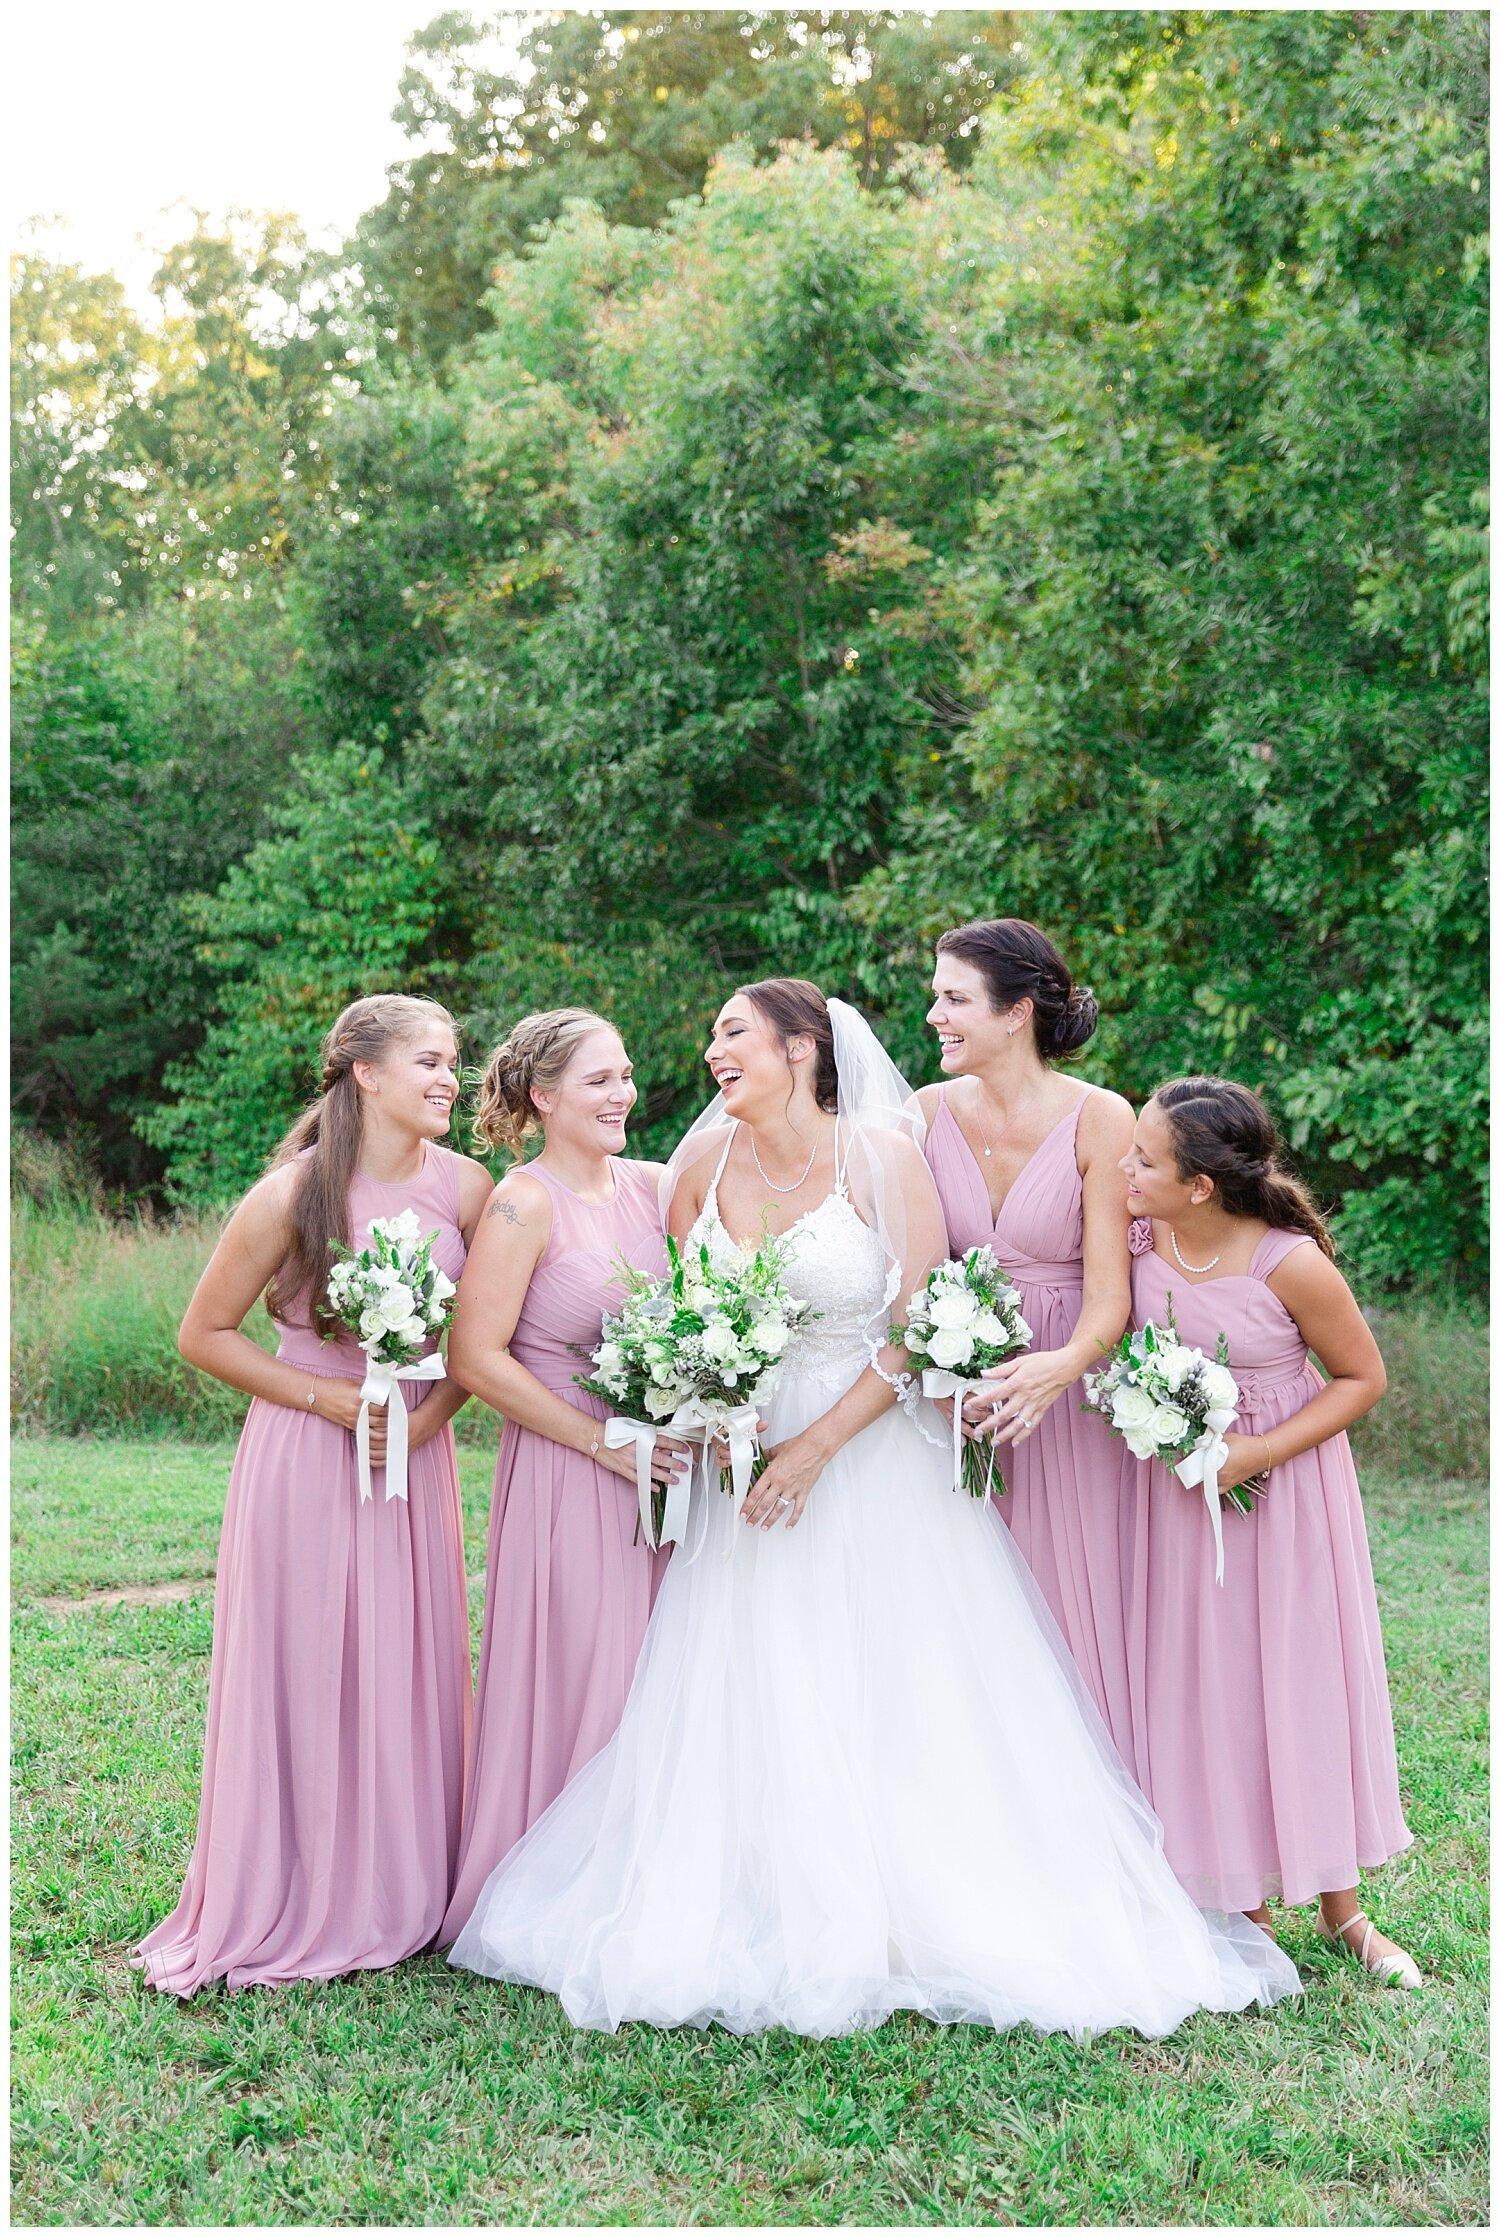 MJMP Richmond VA Wedding Photographer The Venue at Orchard View Farm Wedding Photo_0039.jpg